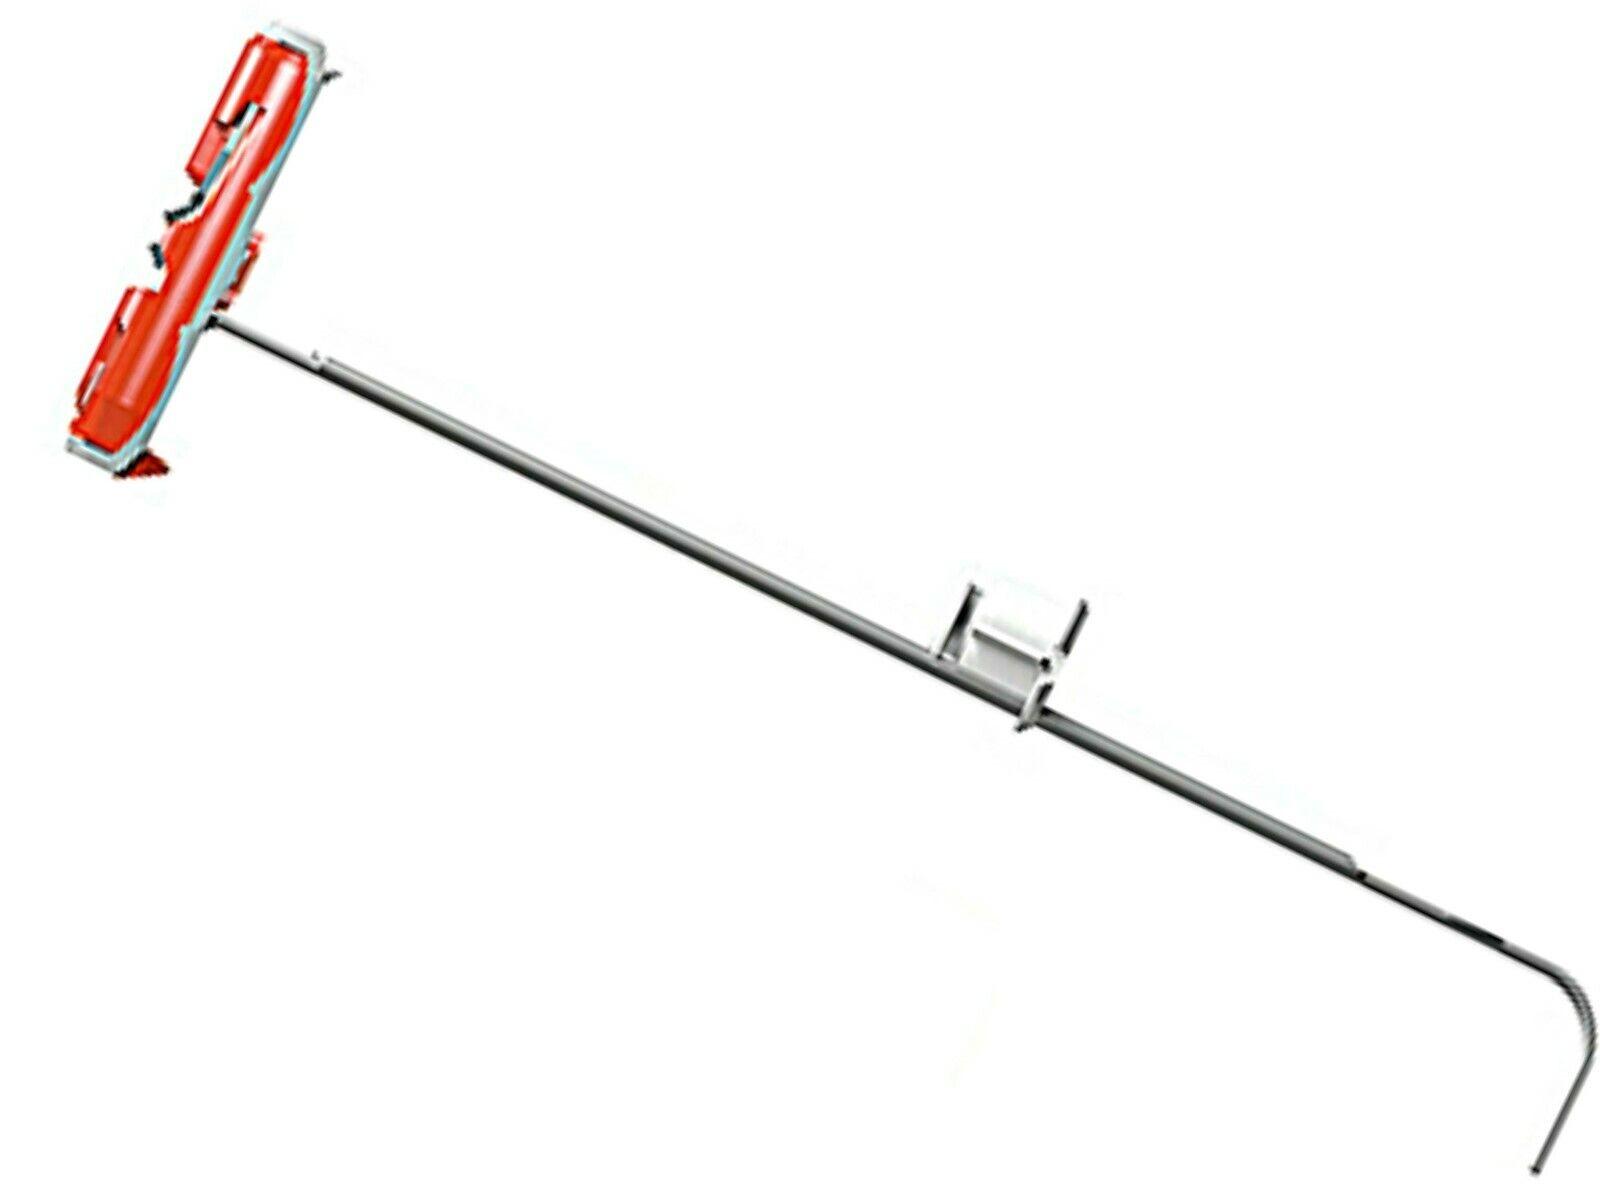 Fischer Duopower Dübel 10x80mm verschiedene Stückzahlen Langversion